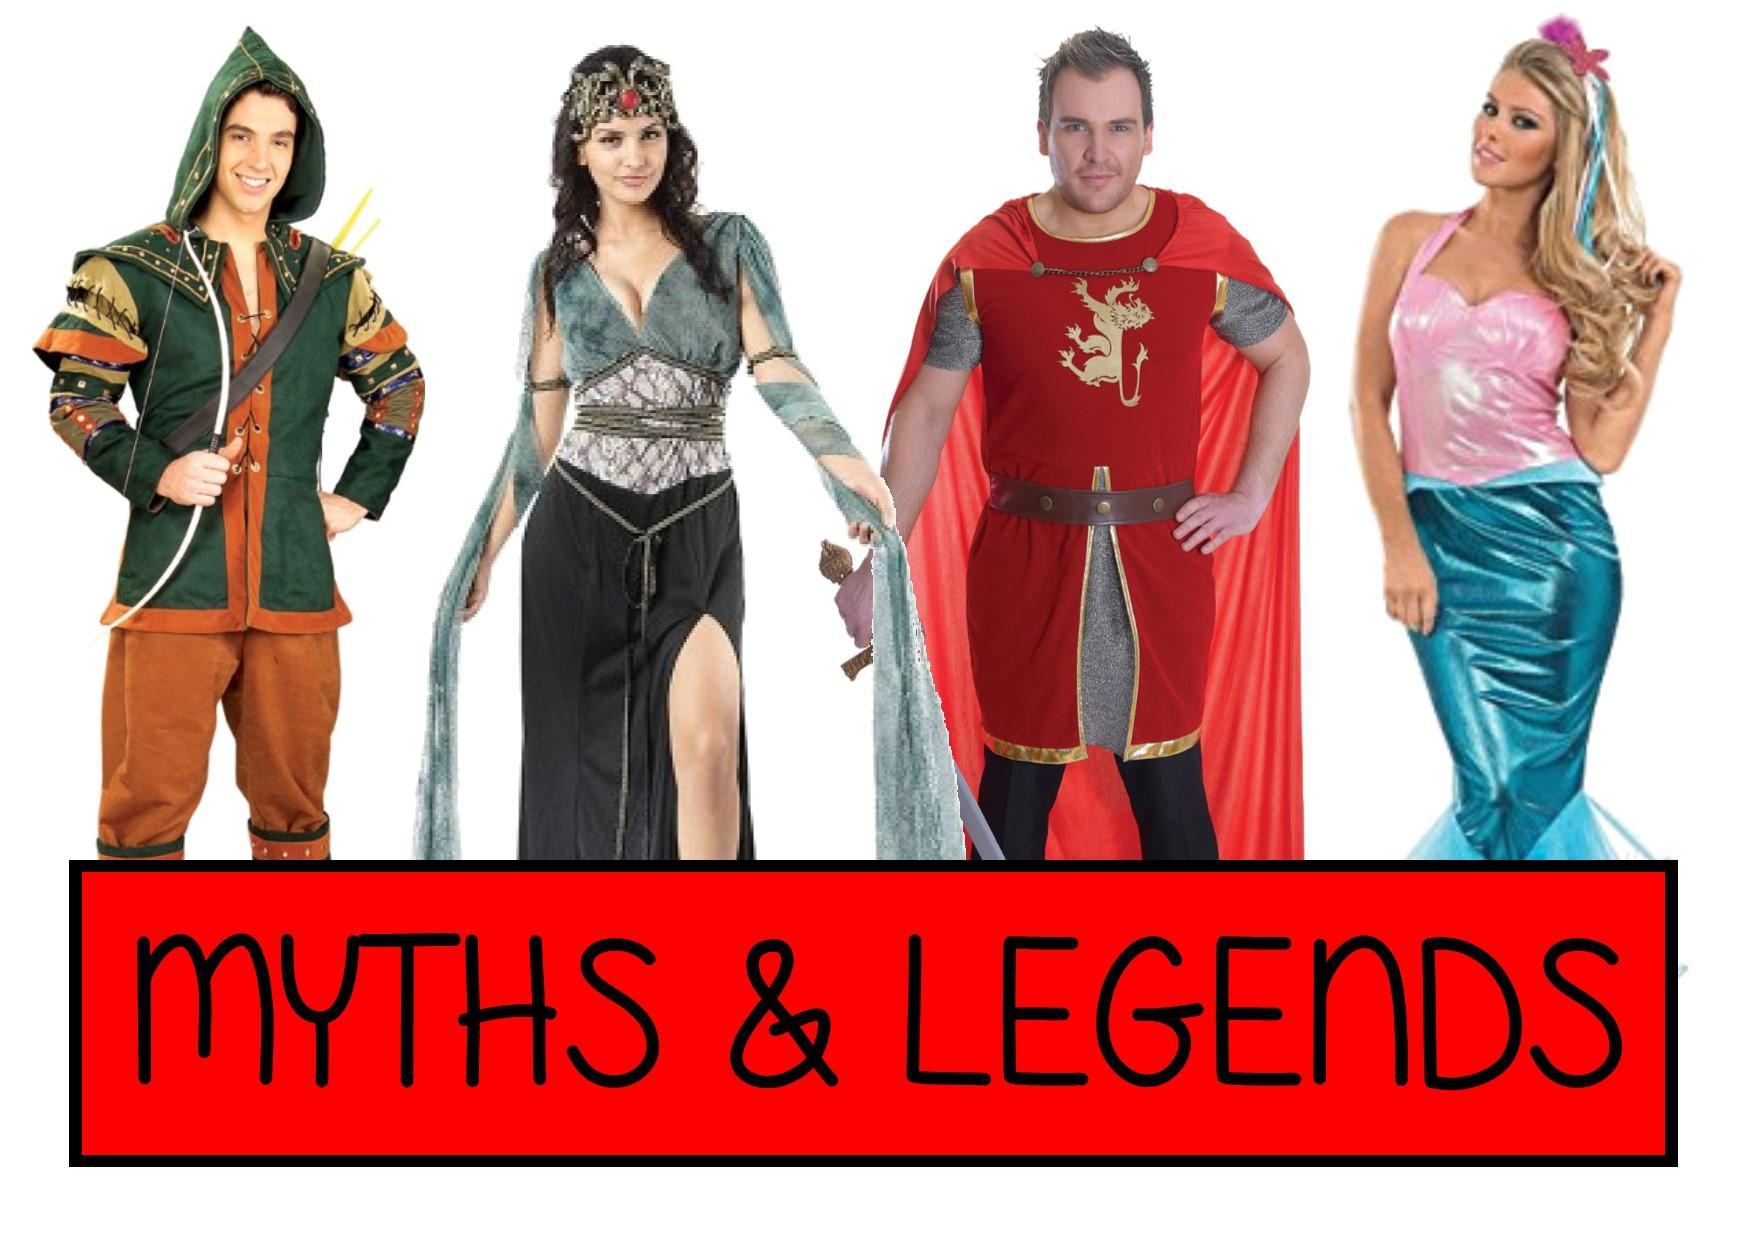 myths and legends fancy dress ideas